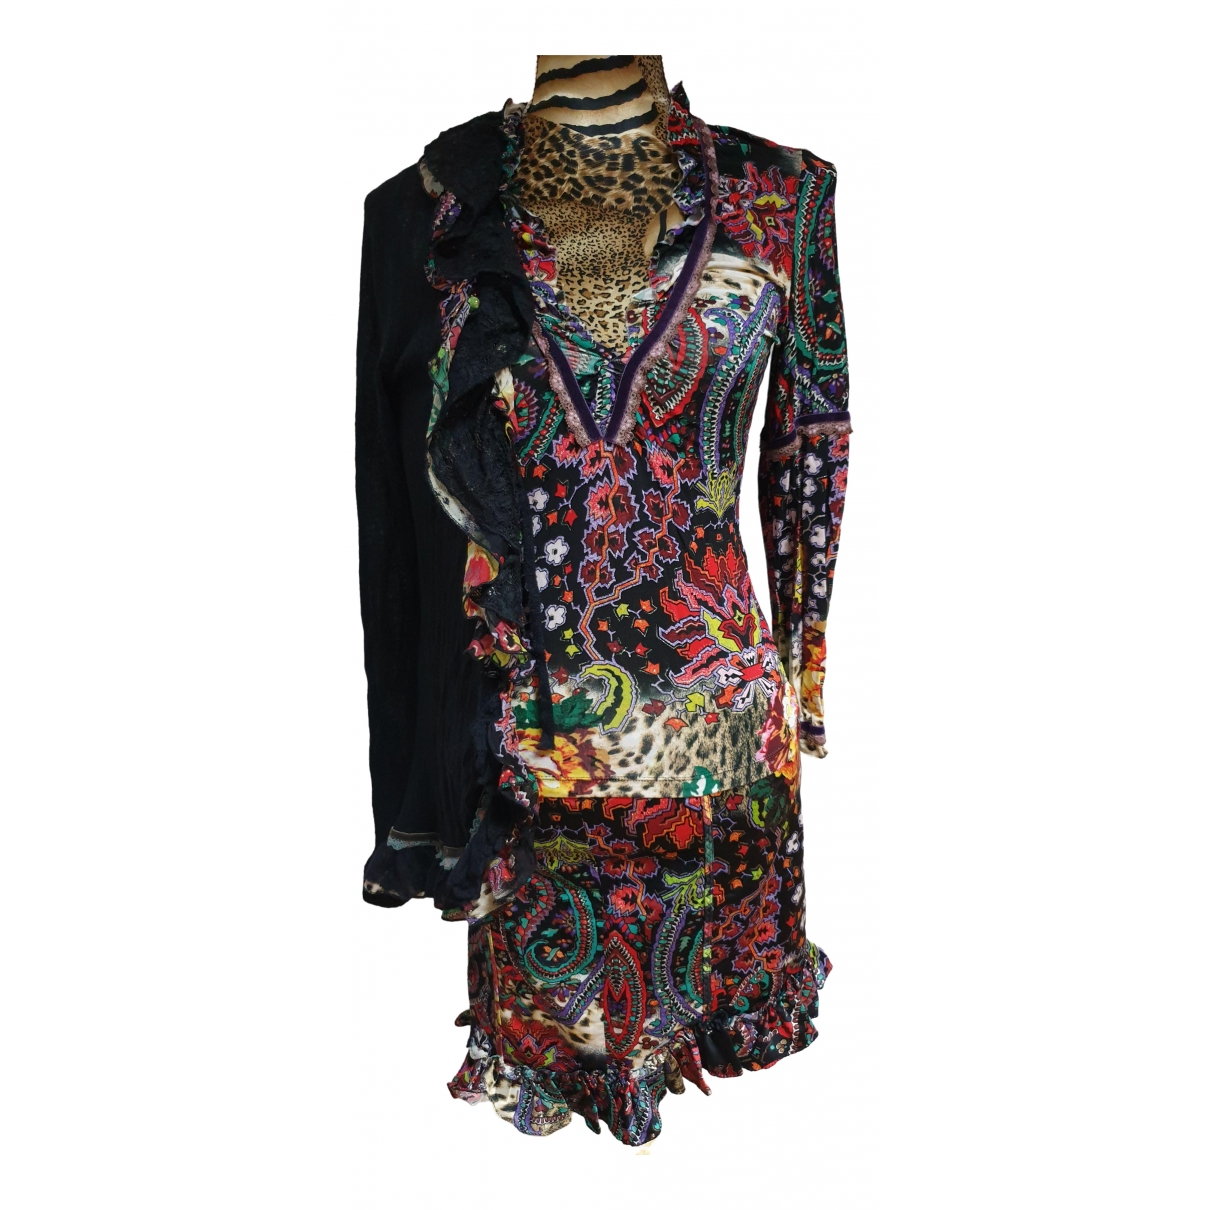 Just Cavalli \N Multicolour dress for Women 42 IT